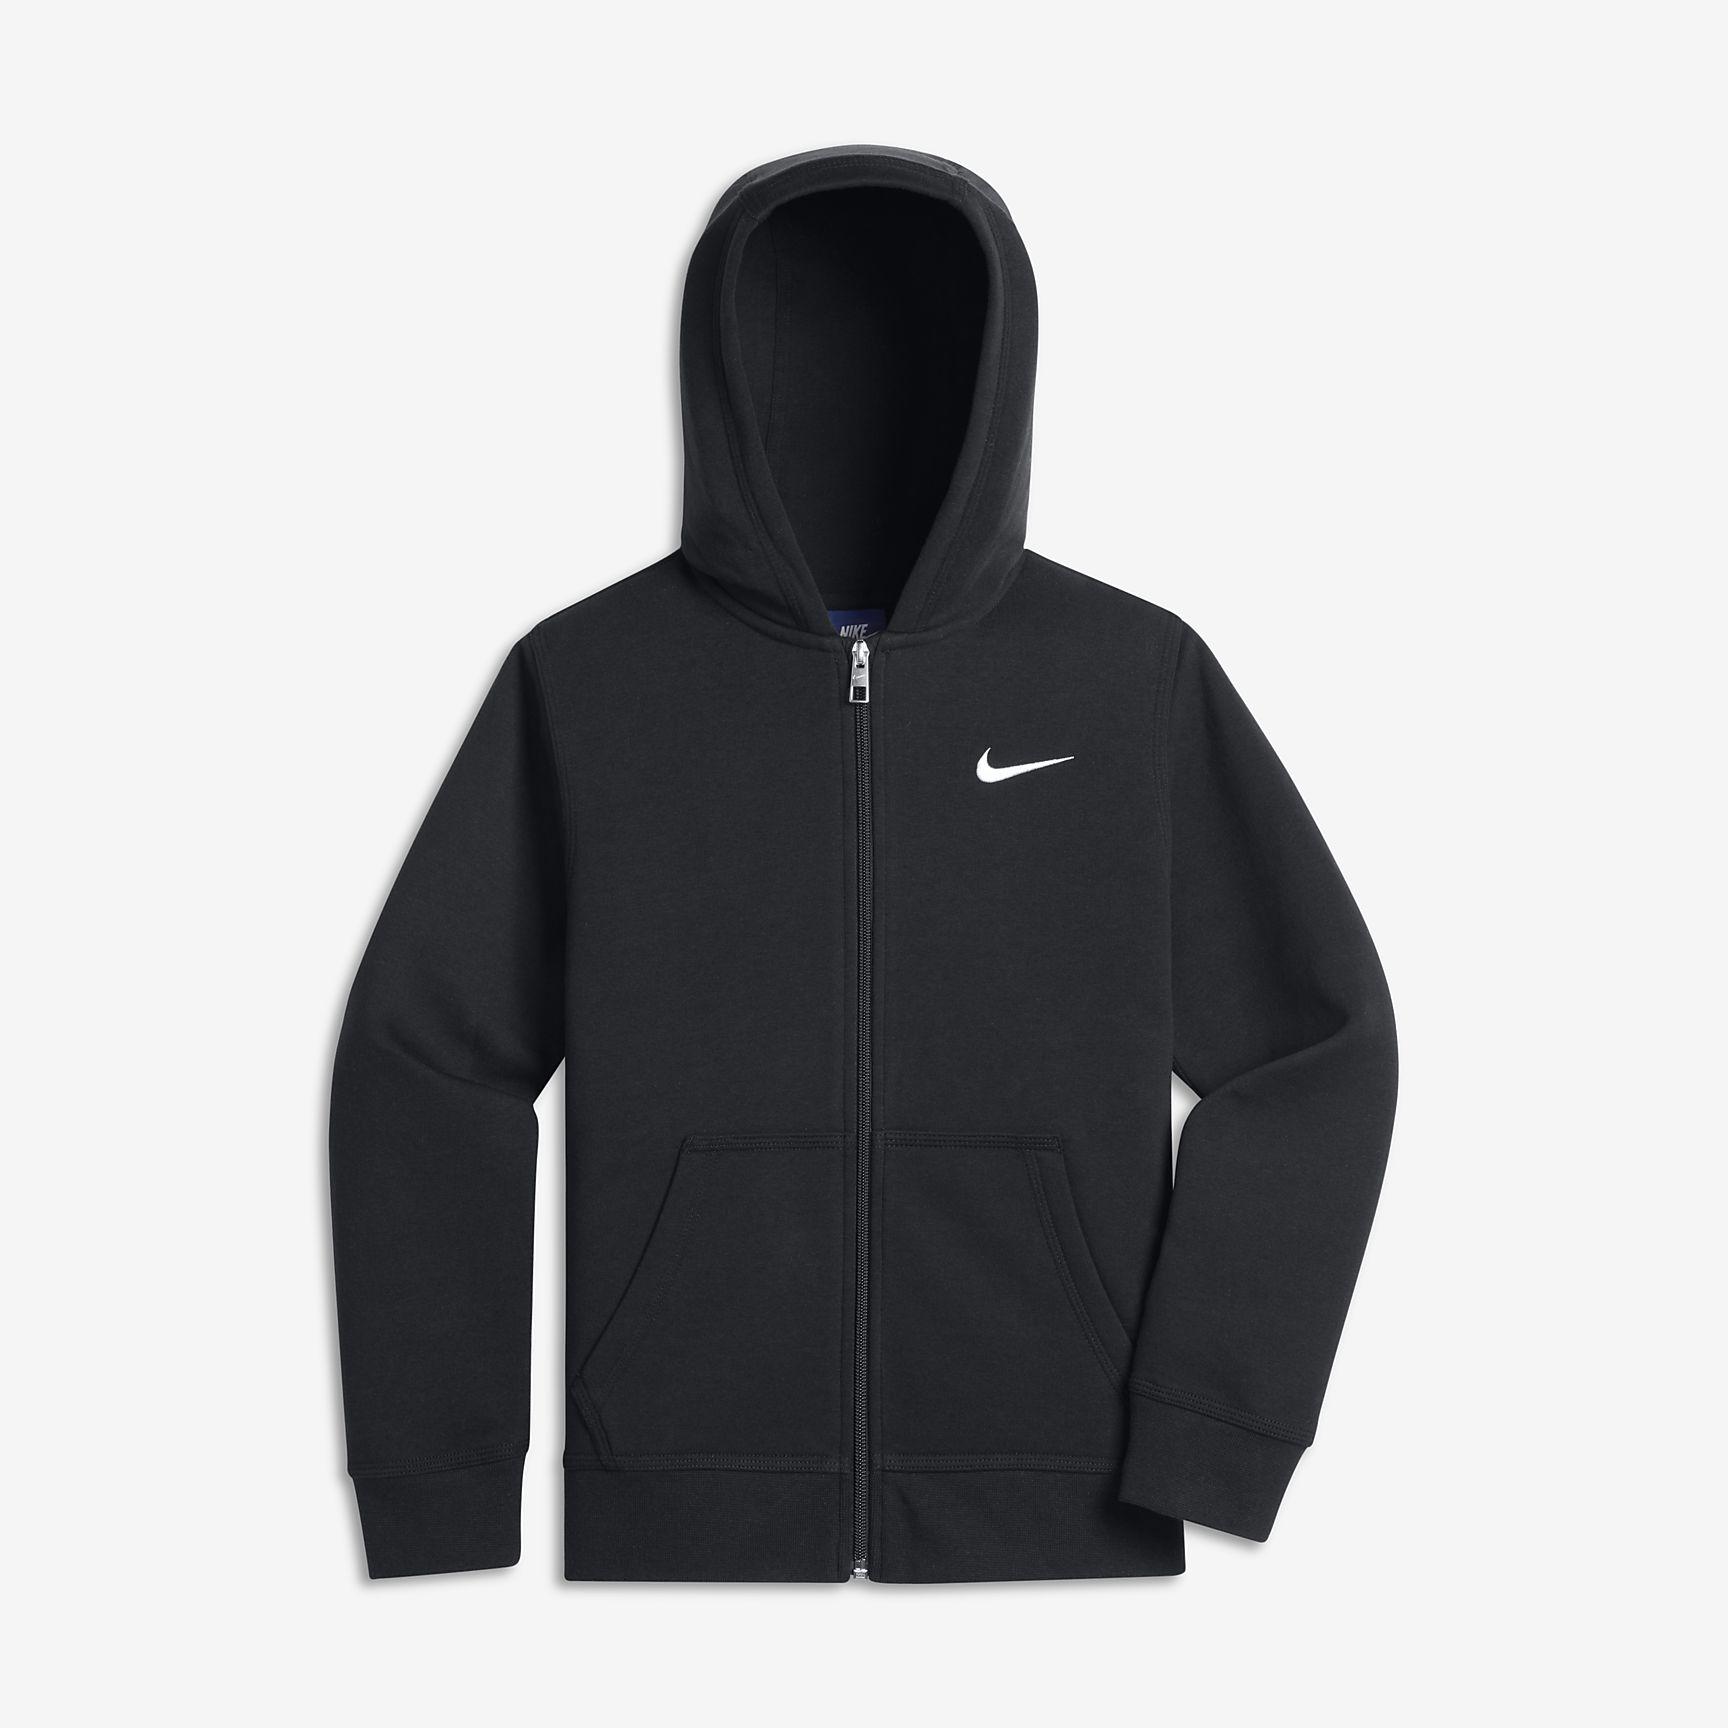 Bluza Nike Brushed Fleece Full-Zip JR S 128-137